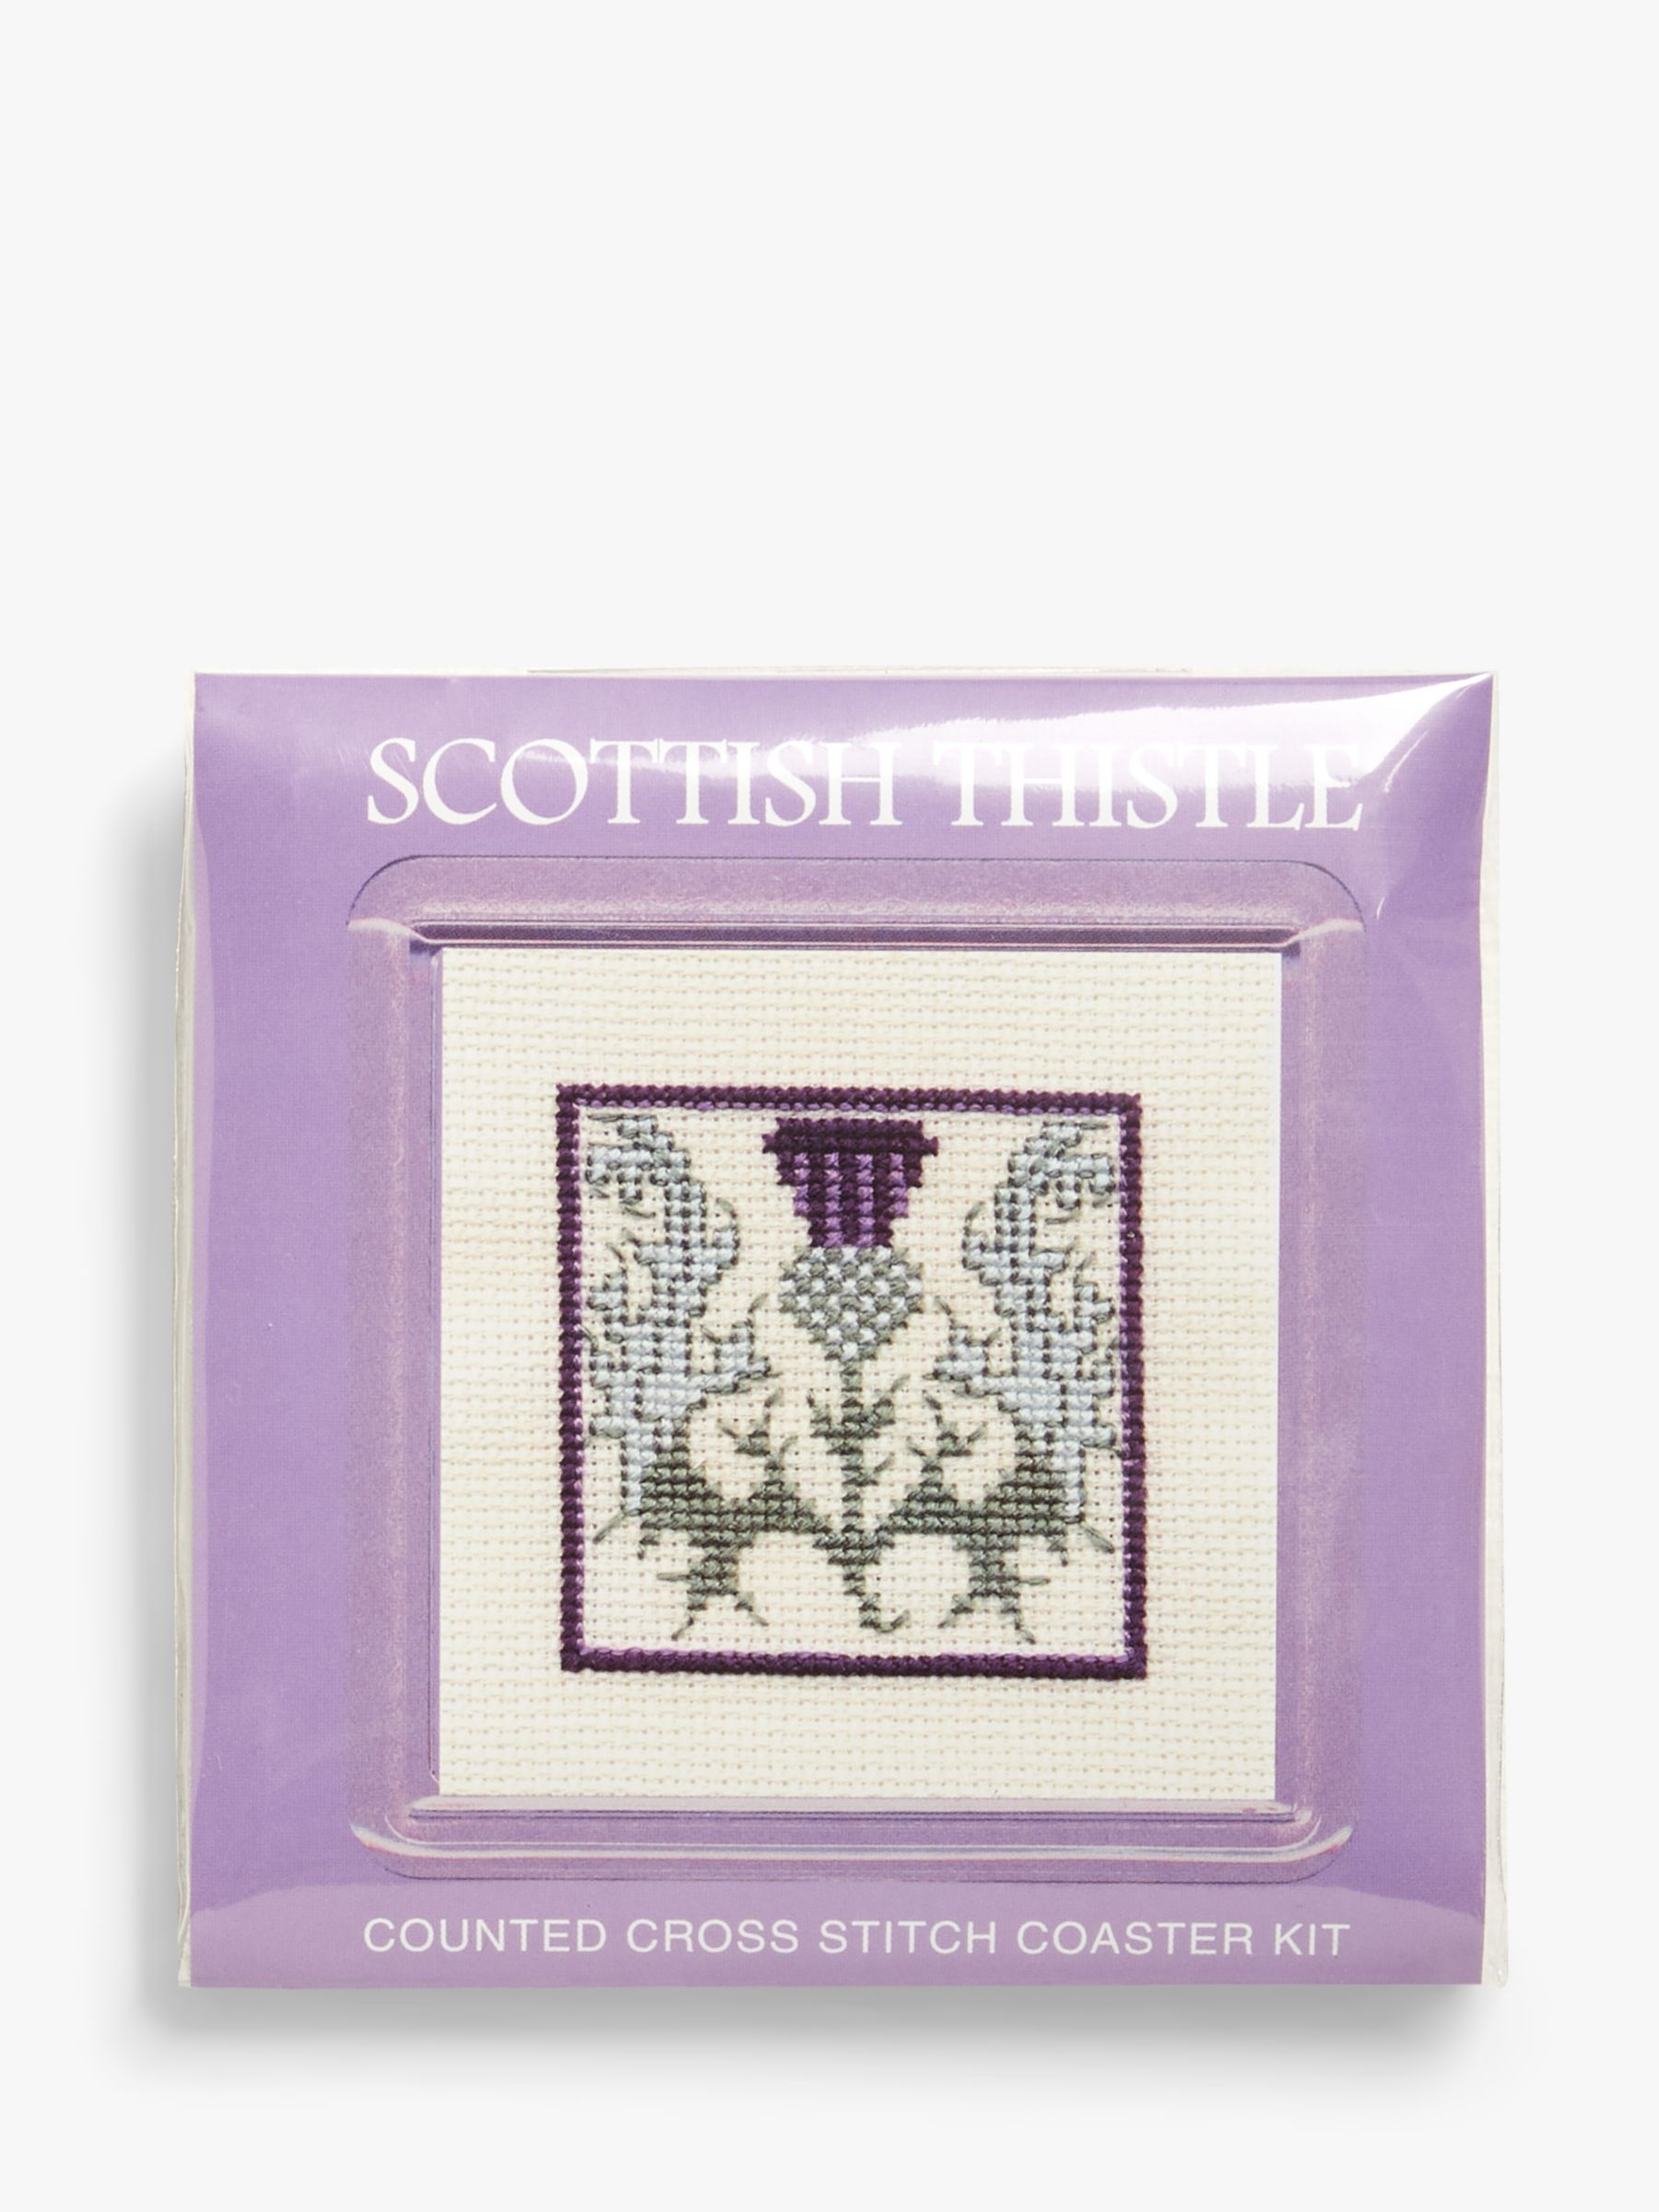 Textile Heritage Thistles Coaster Embroidery Kit